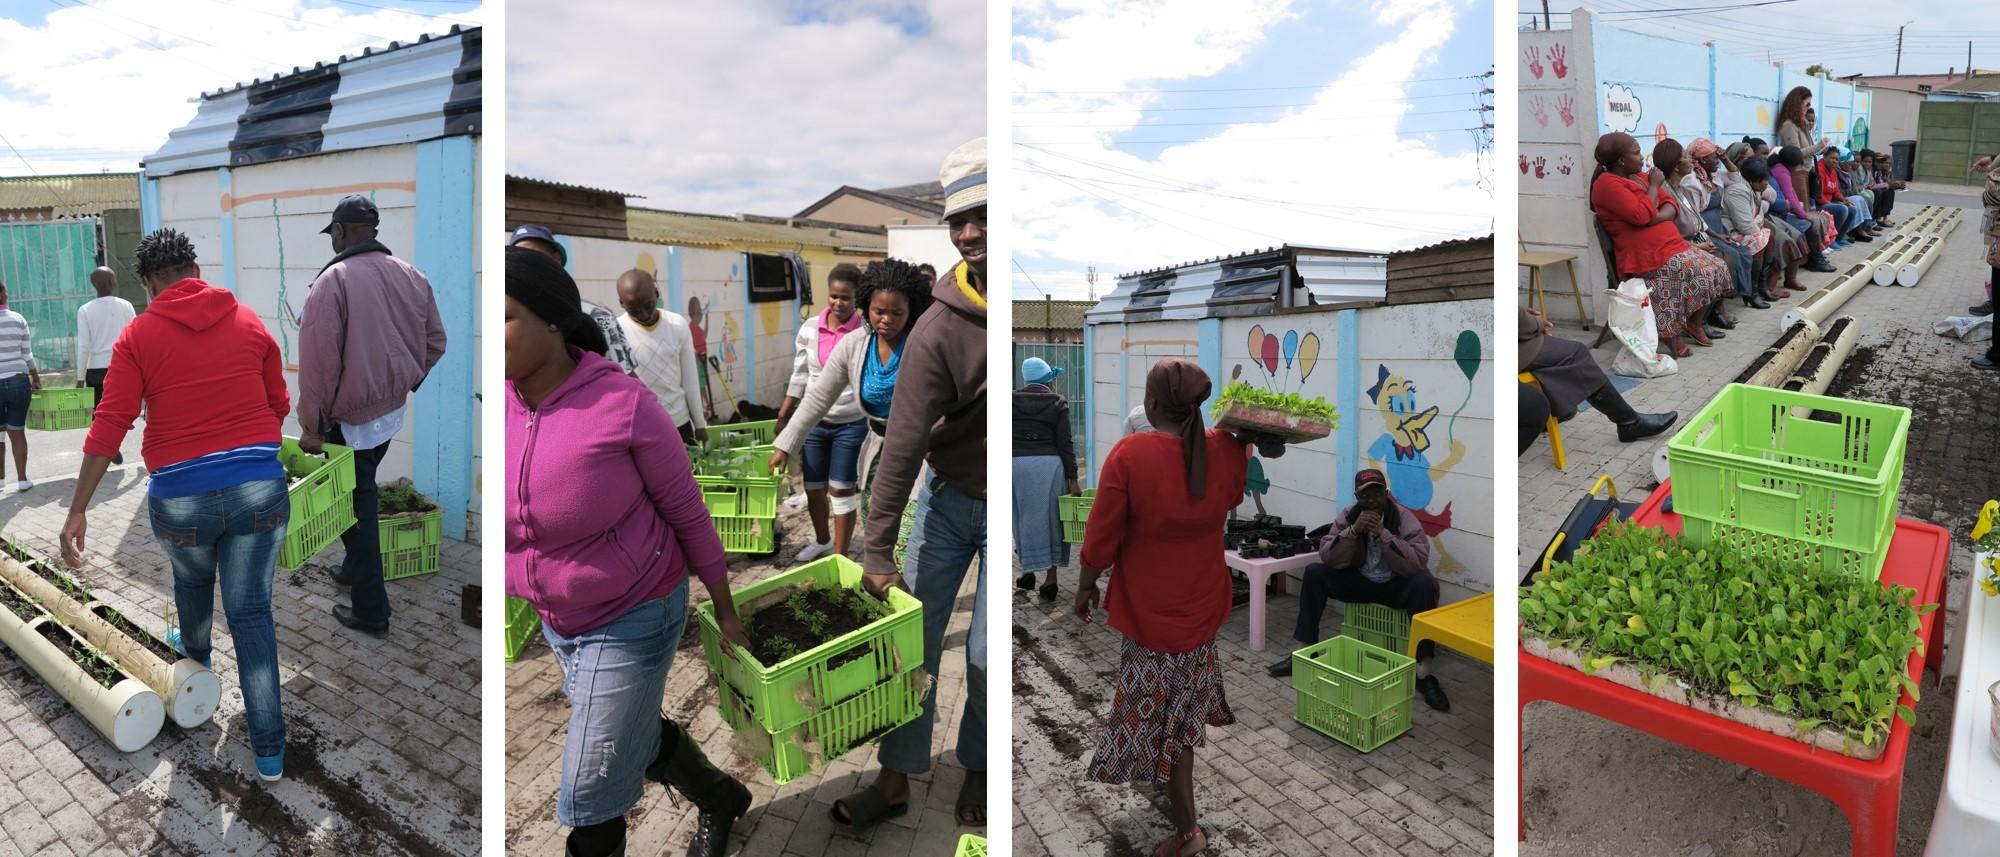 Planting the vertical food garden, Langa, 3rd Sept 2013, Gege creche 3